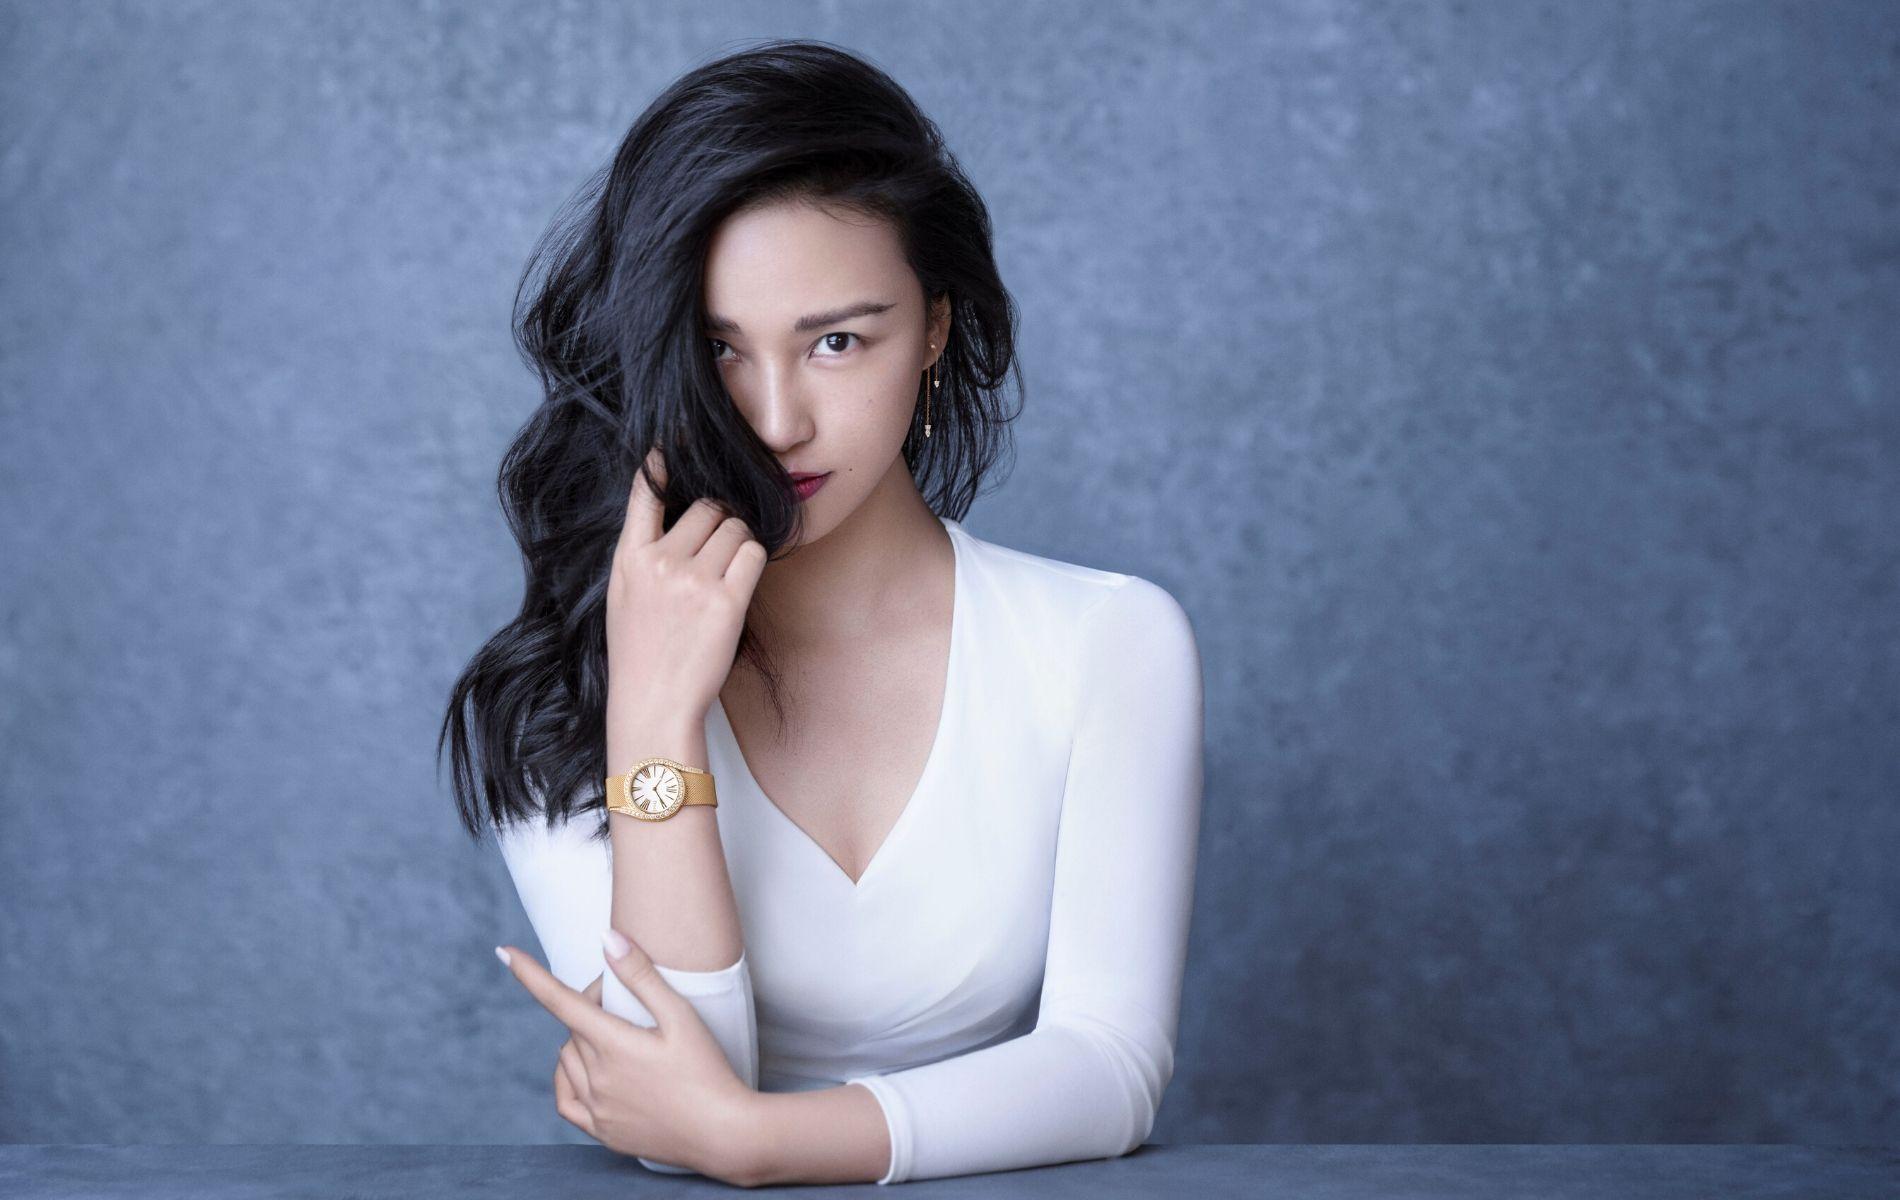 Fashion Photographer Extraordinaire: Chen Man